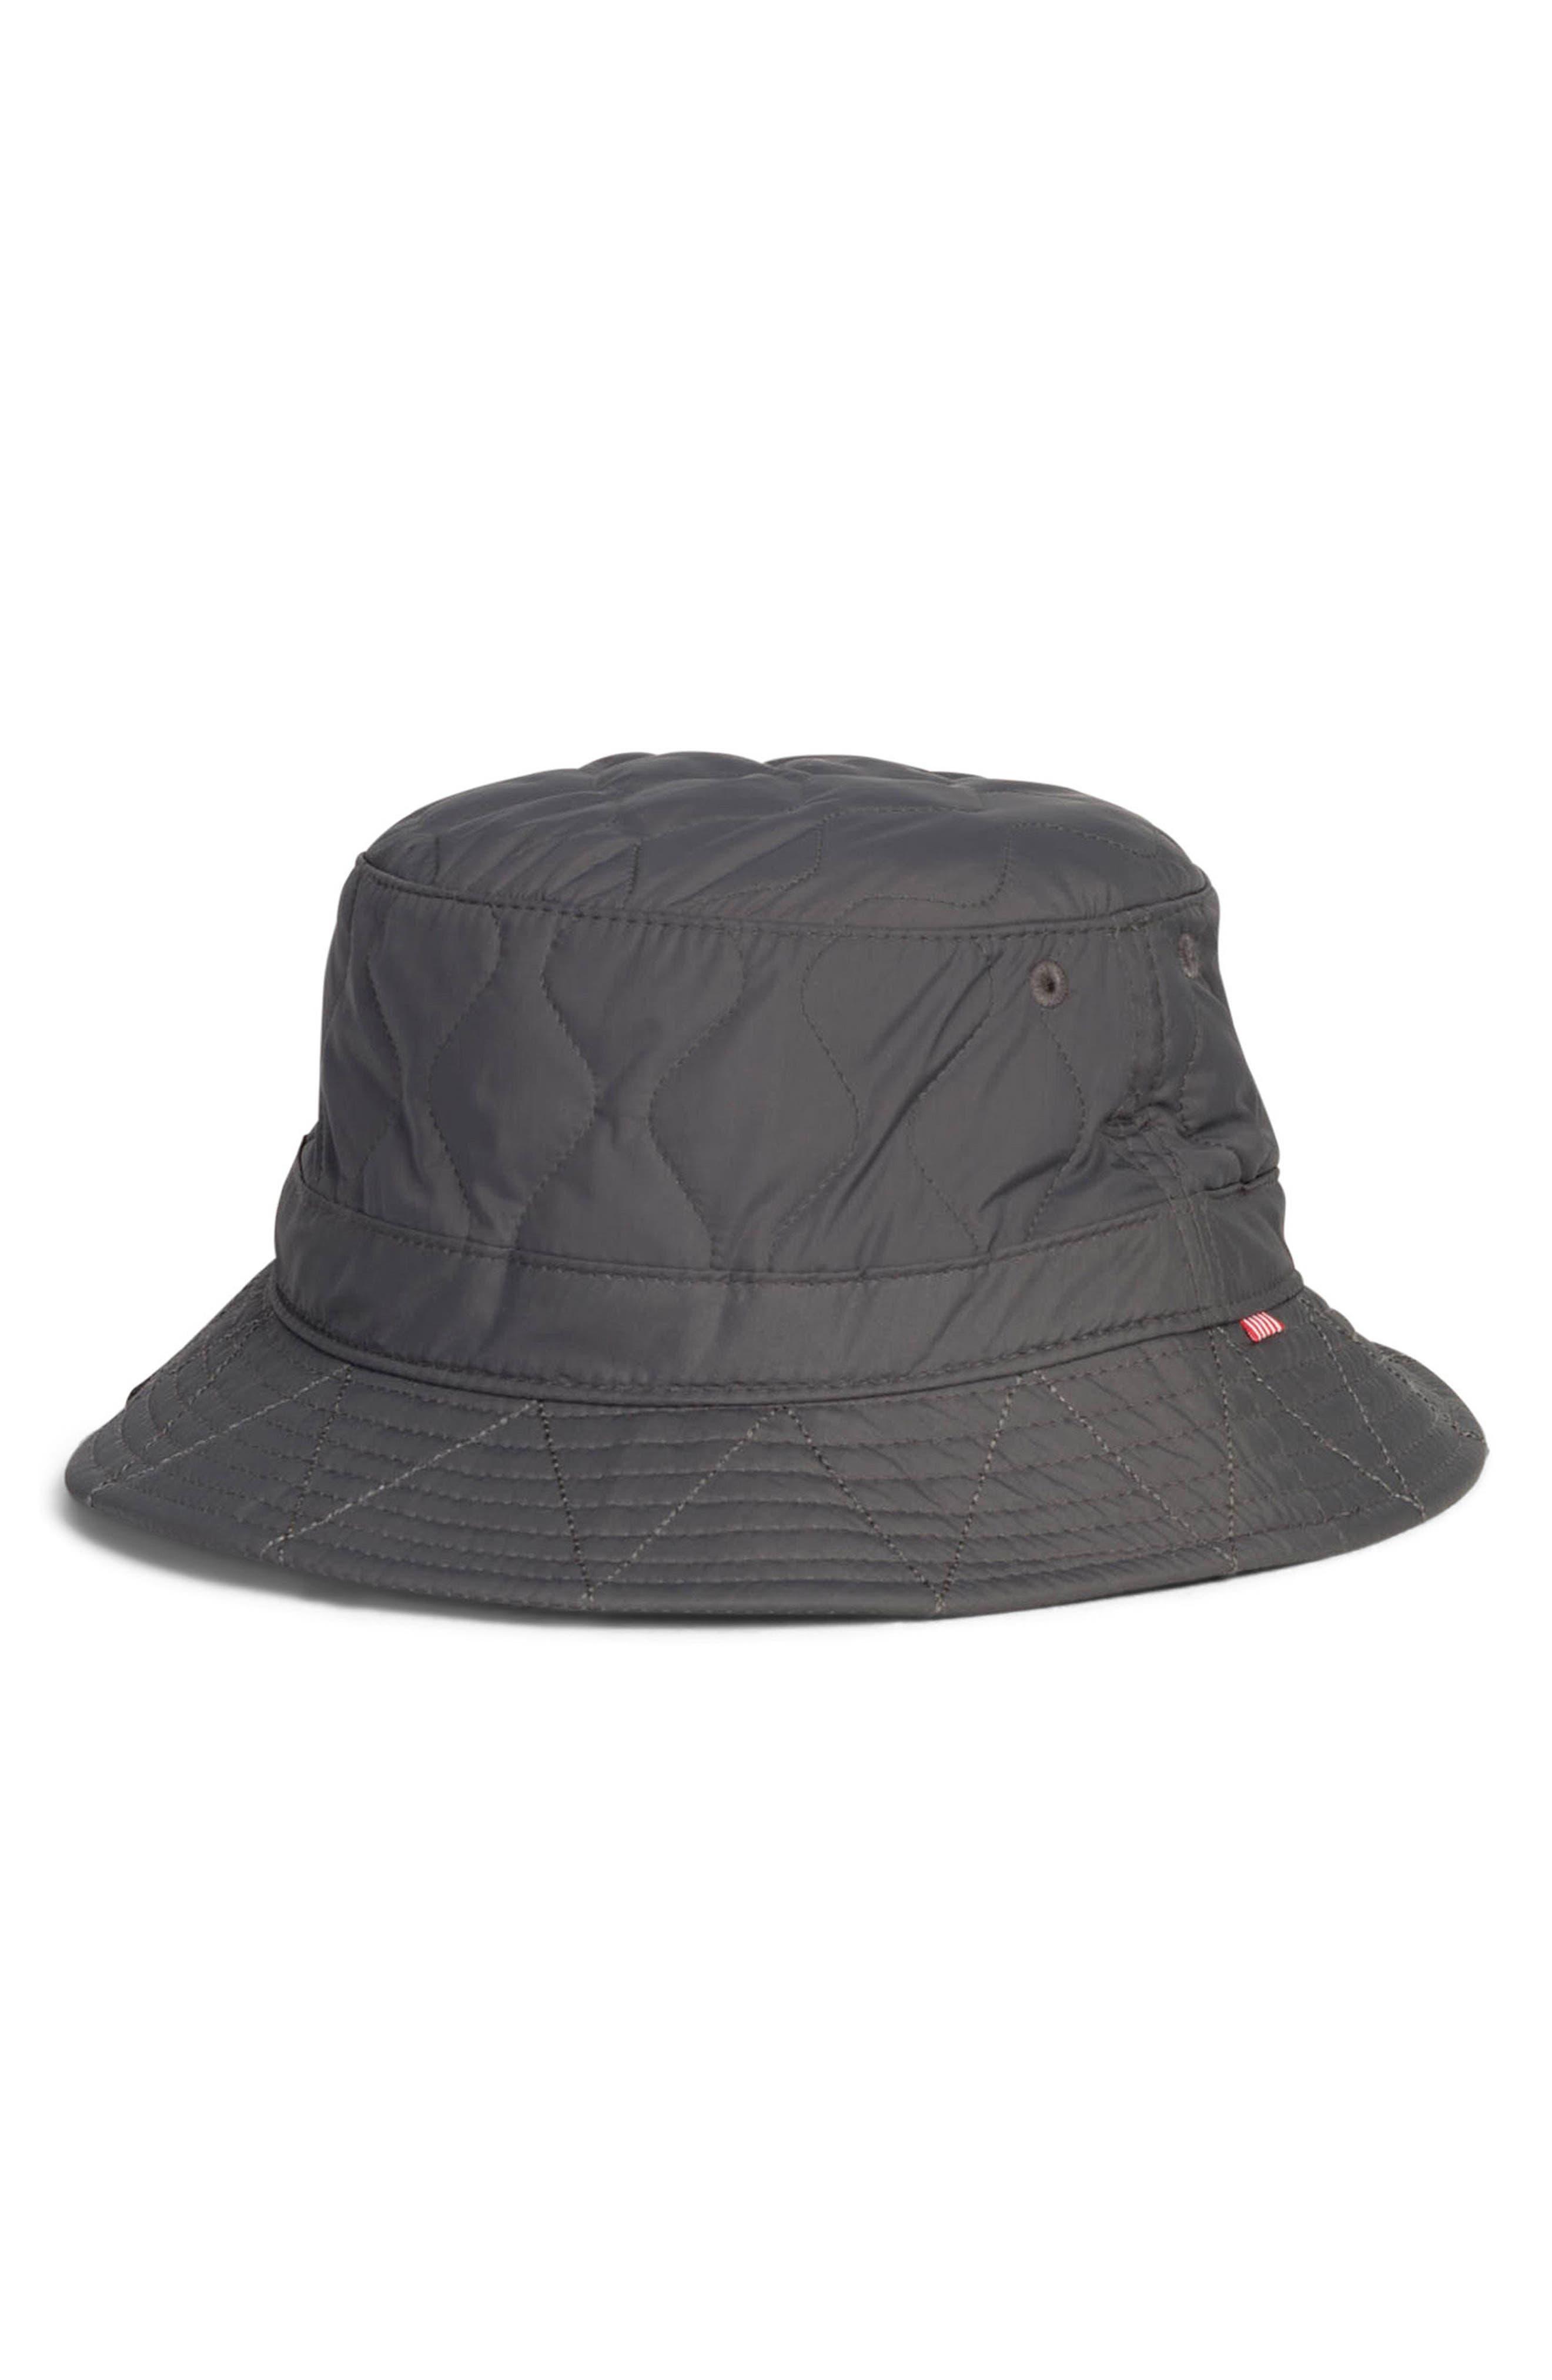 Lake Bucket Hat,                         Main,                         color,